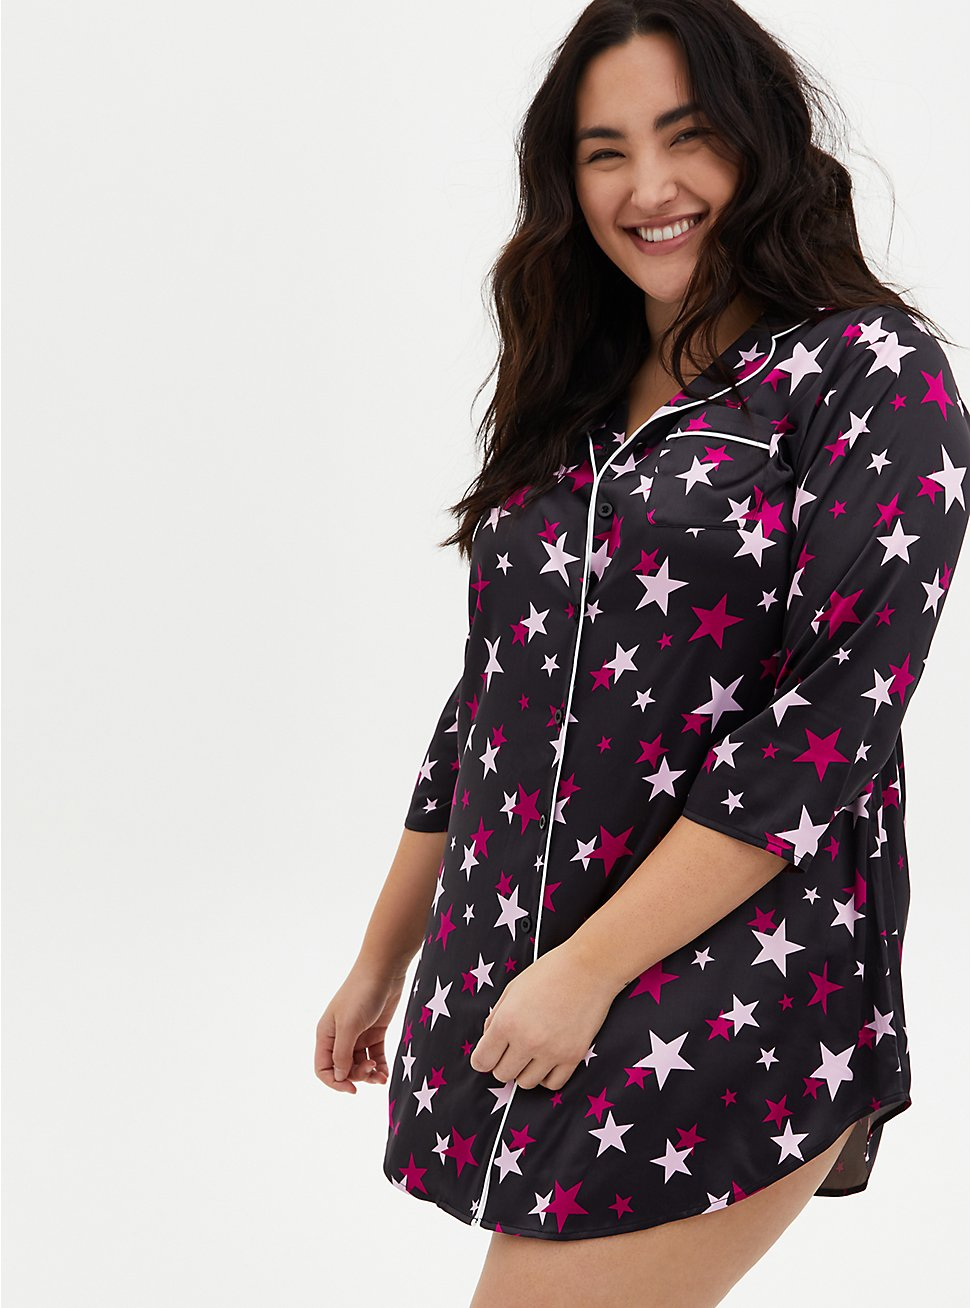 Black & Pink Star Stretch Satin Sleep Dress, MULTI, hi-res